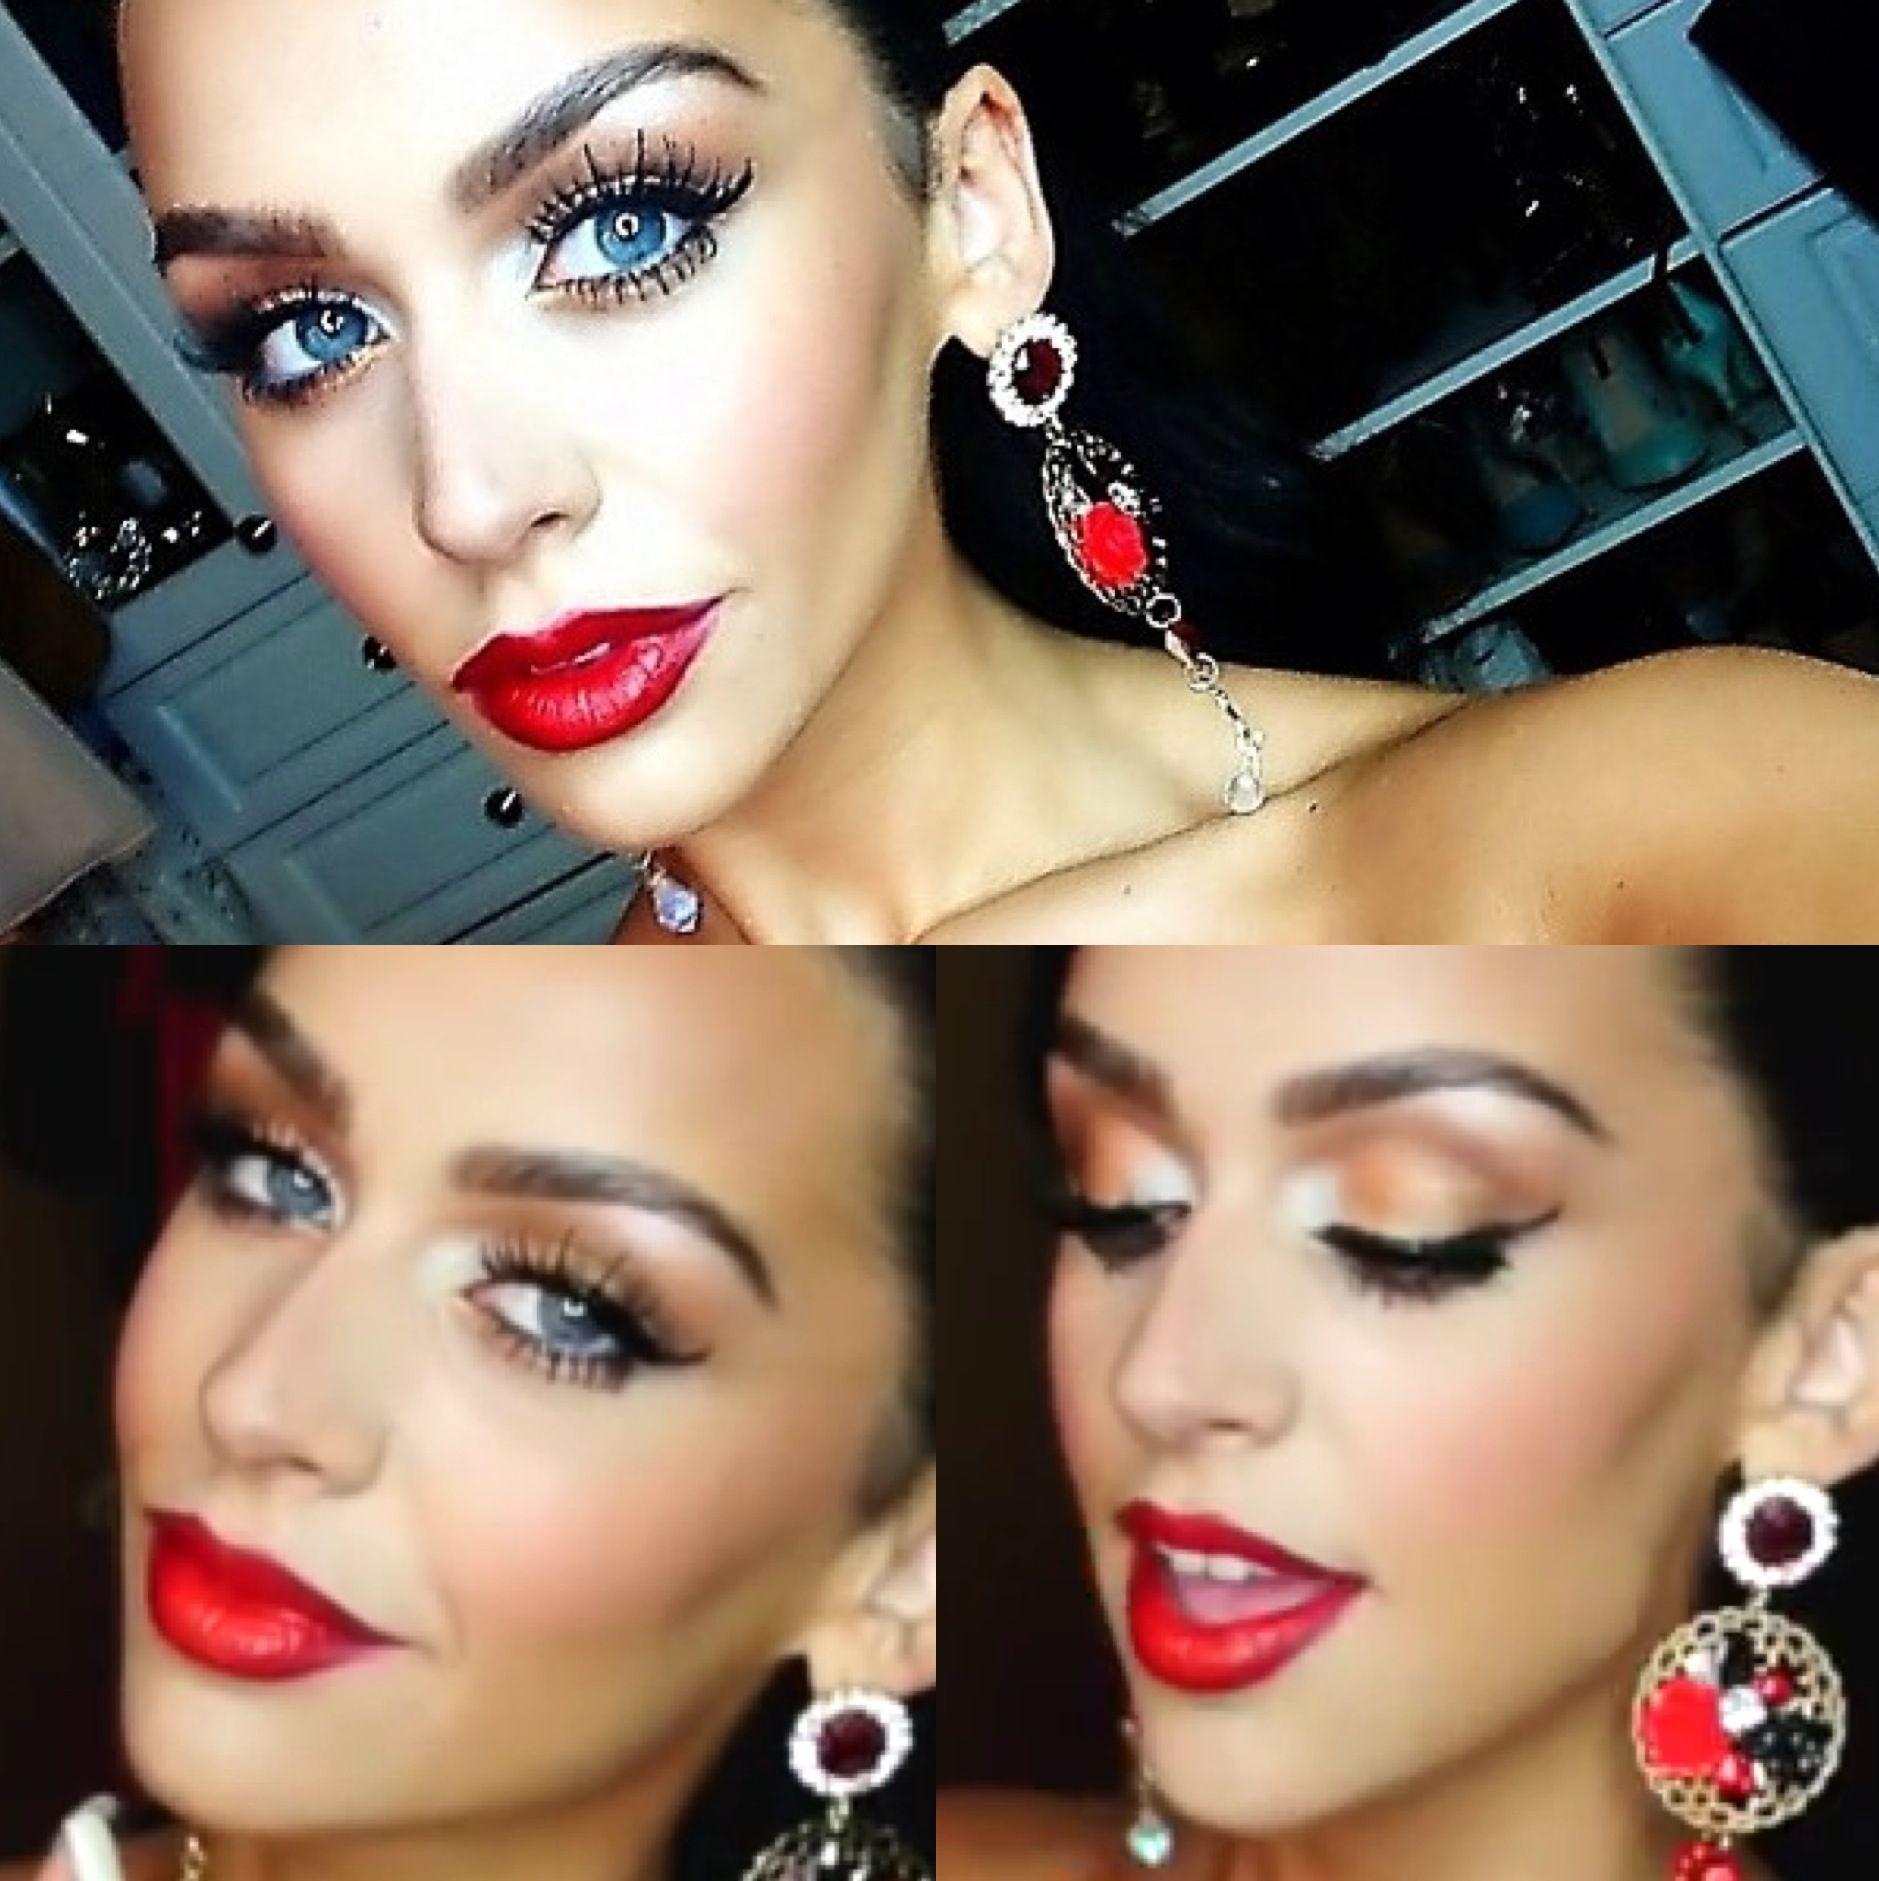 Carli Bybel Kim Kardashian Makeup: Bronze Smokey Eye & Red Lips - PRODUCTS USED: L'Oreal Magic ...